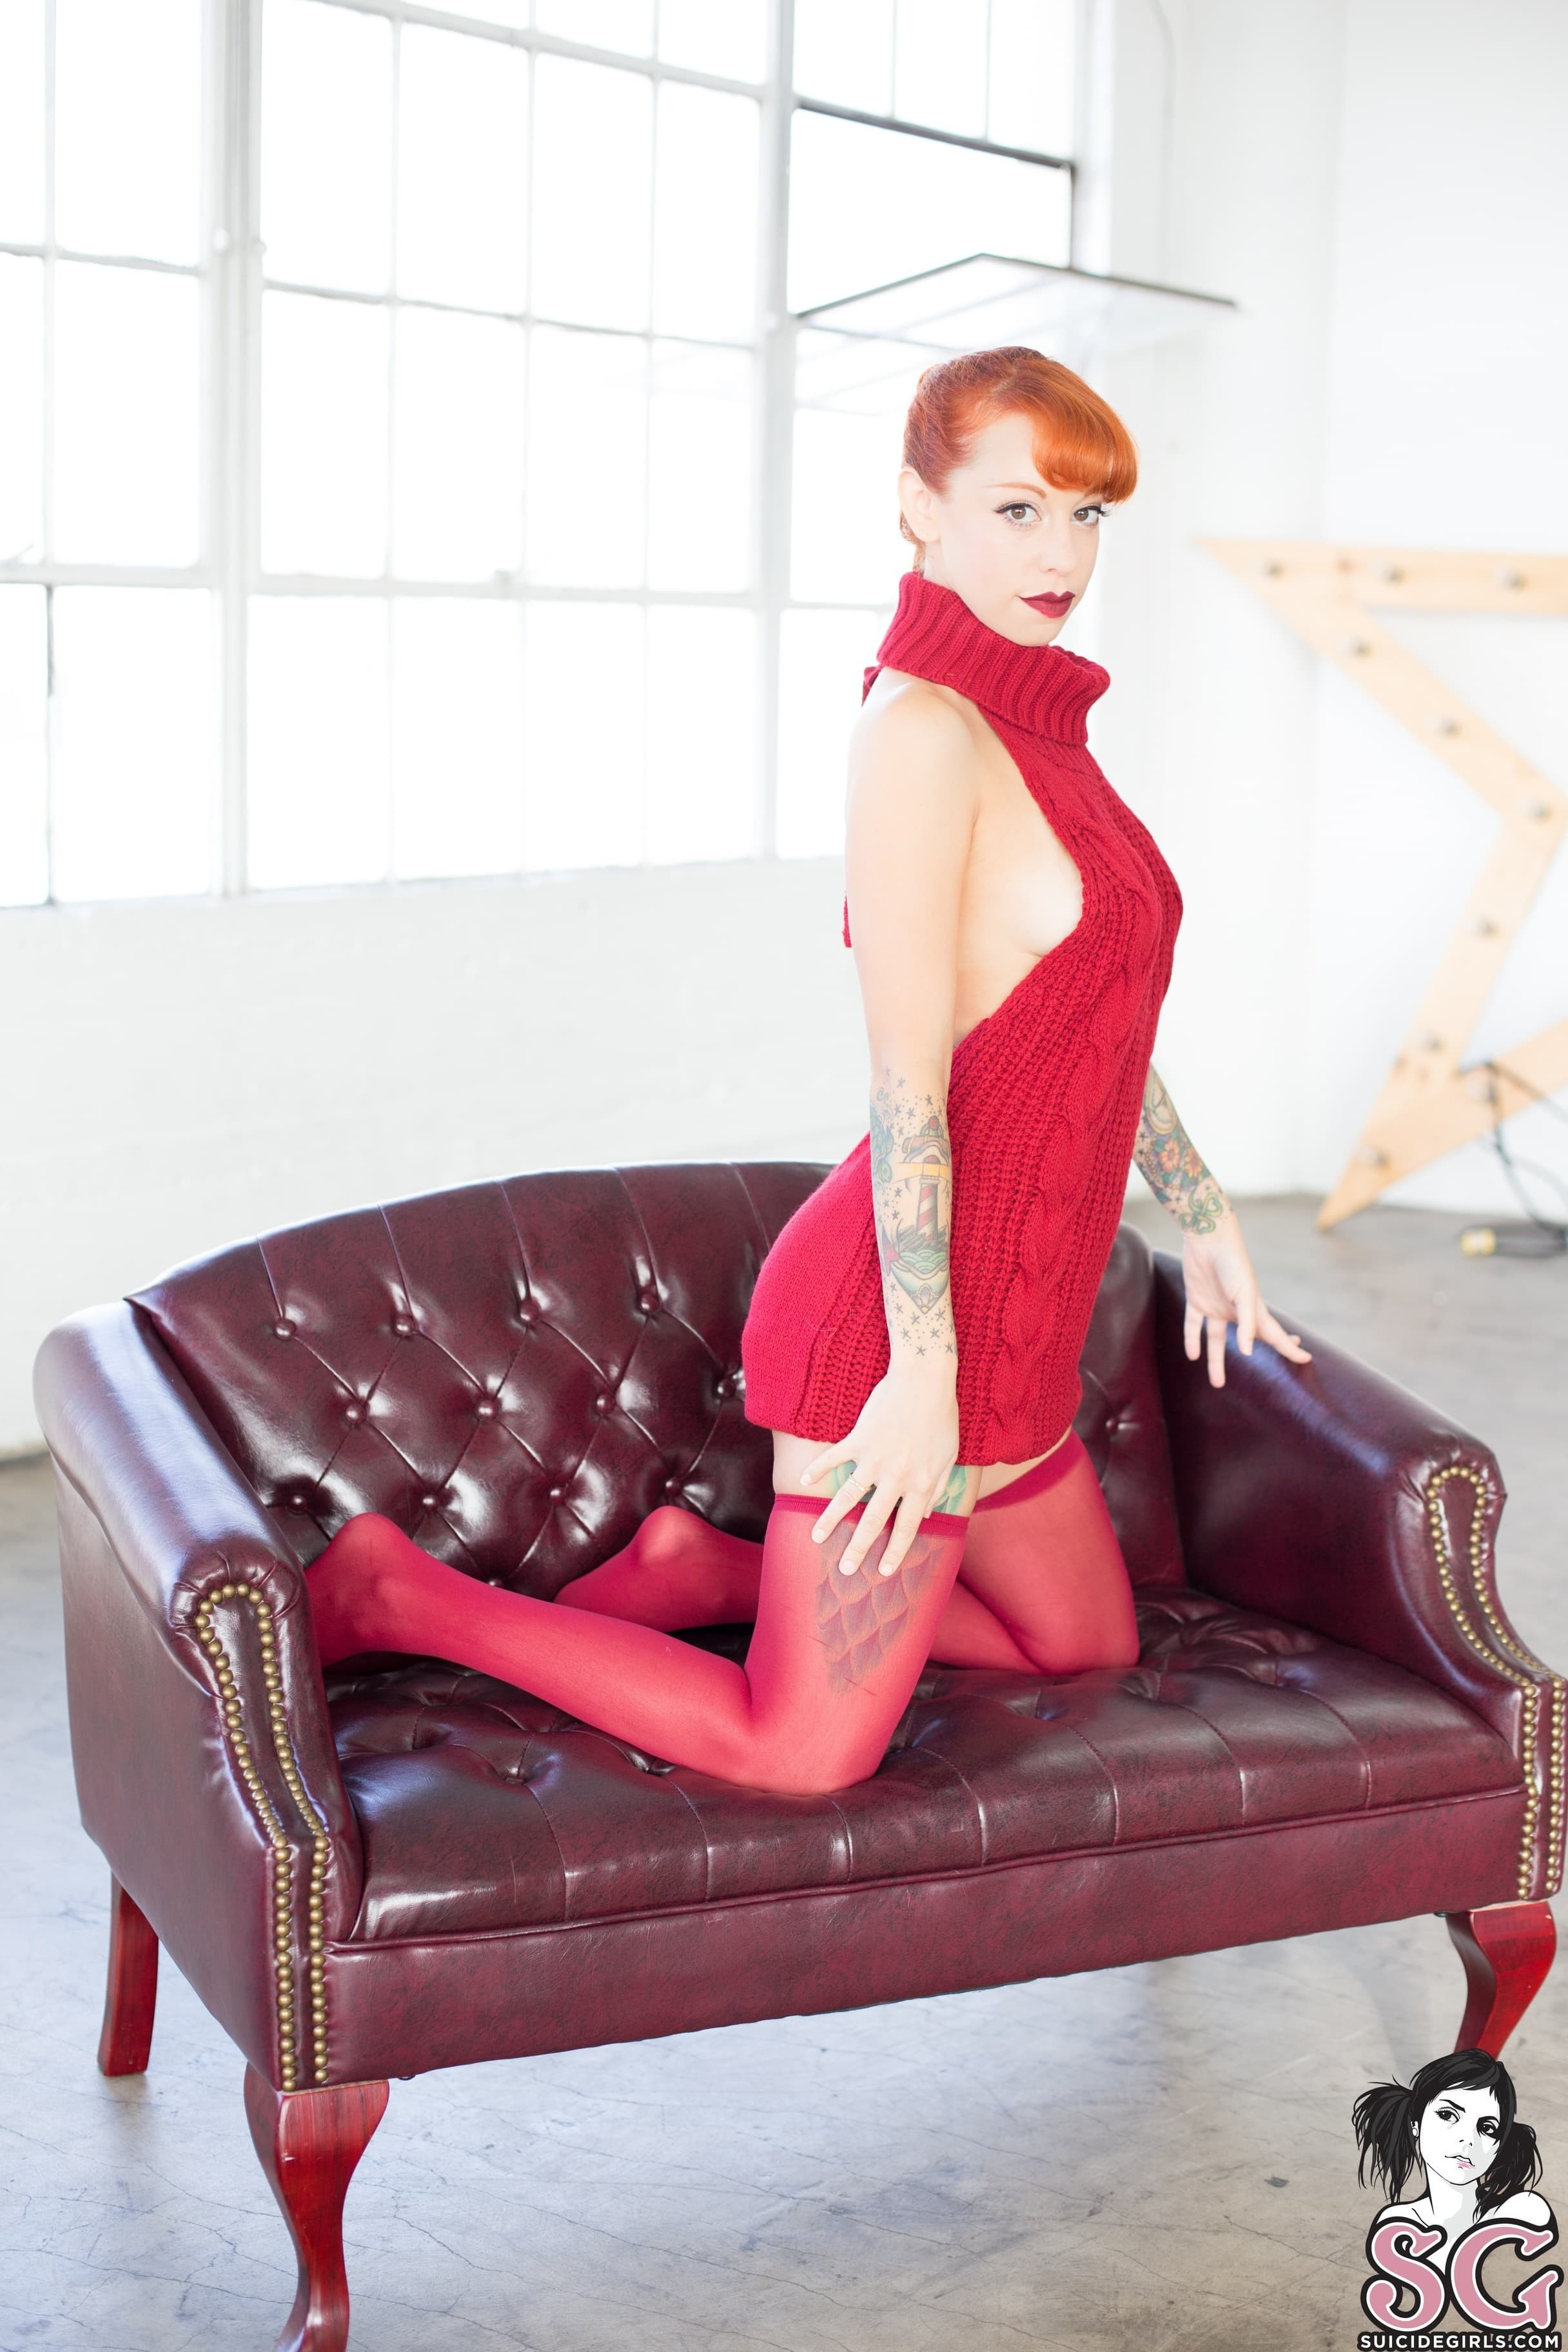 Рыжая баба в чулочках прогнулась раком на диване - фото